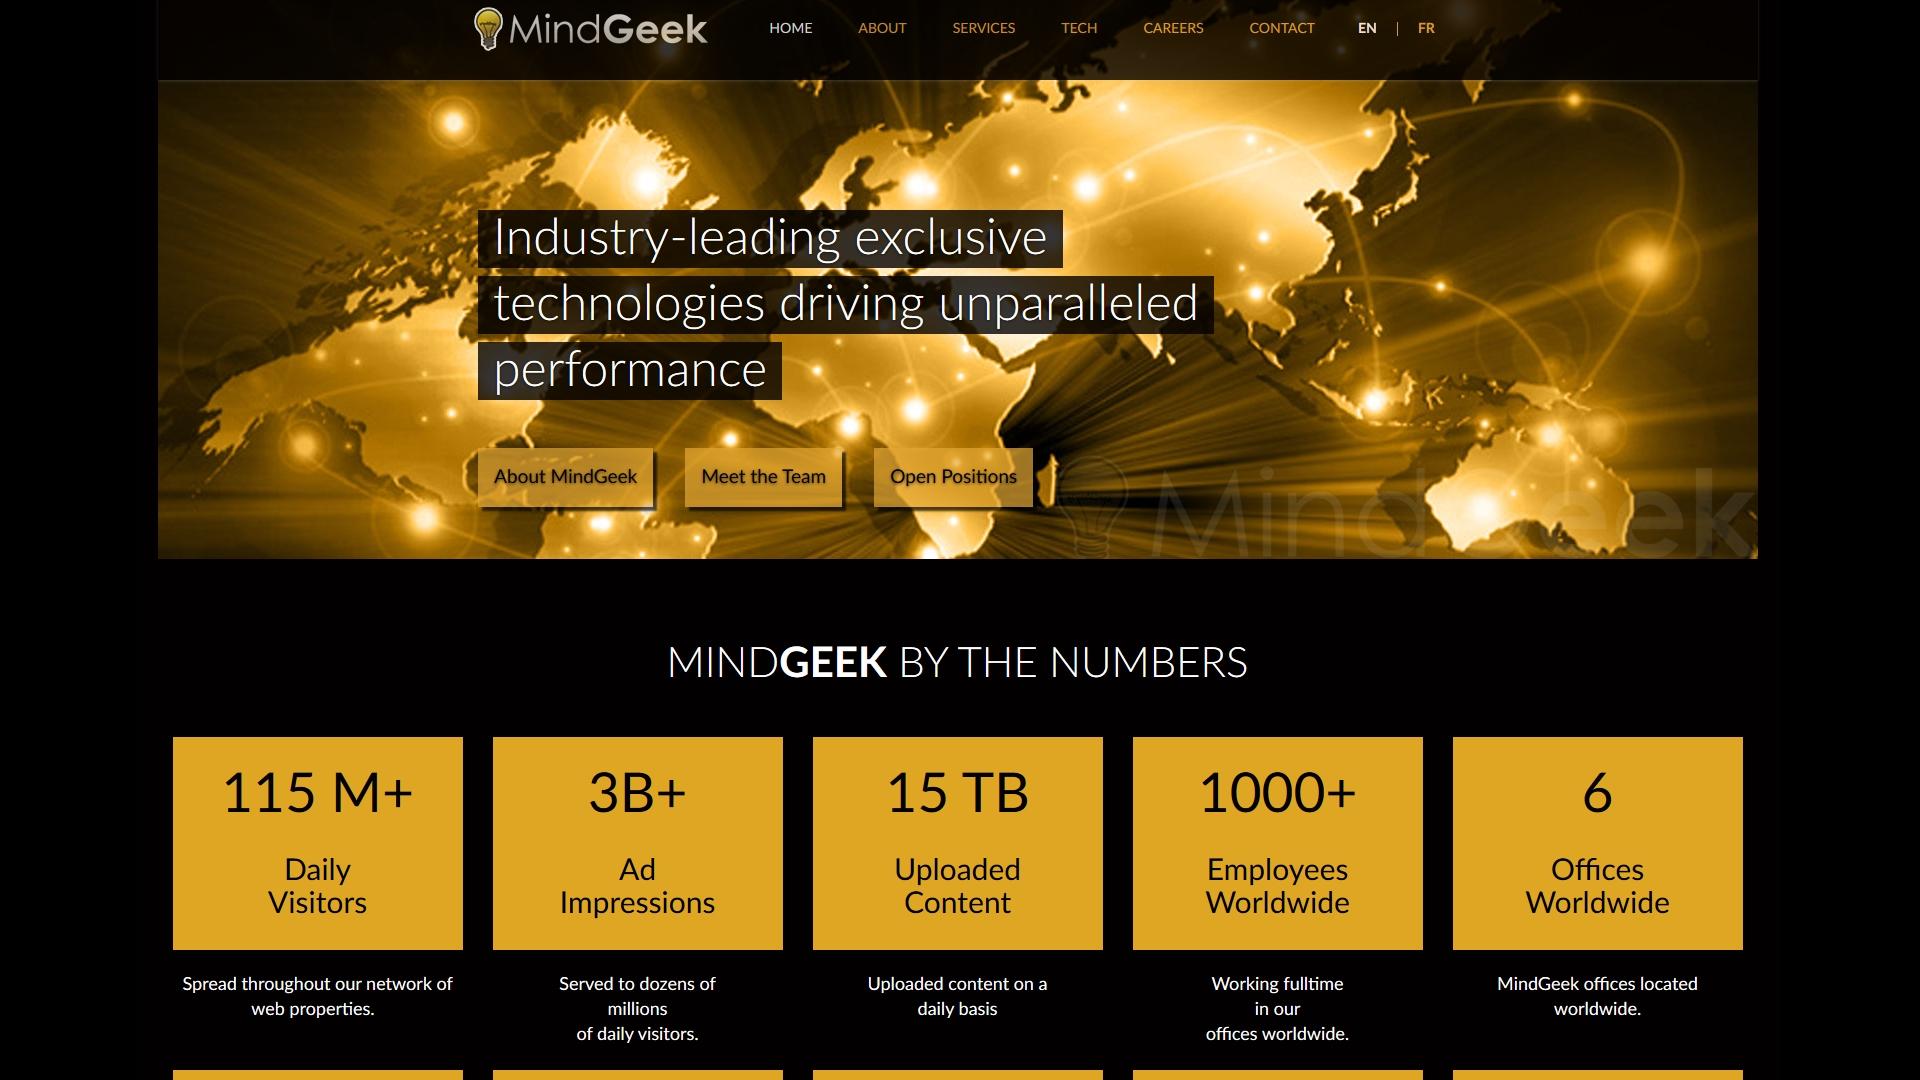 Mindgeek owns the internet's biggest porn sites including PornHub, RedTube and YouPorn